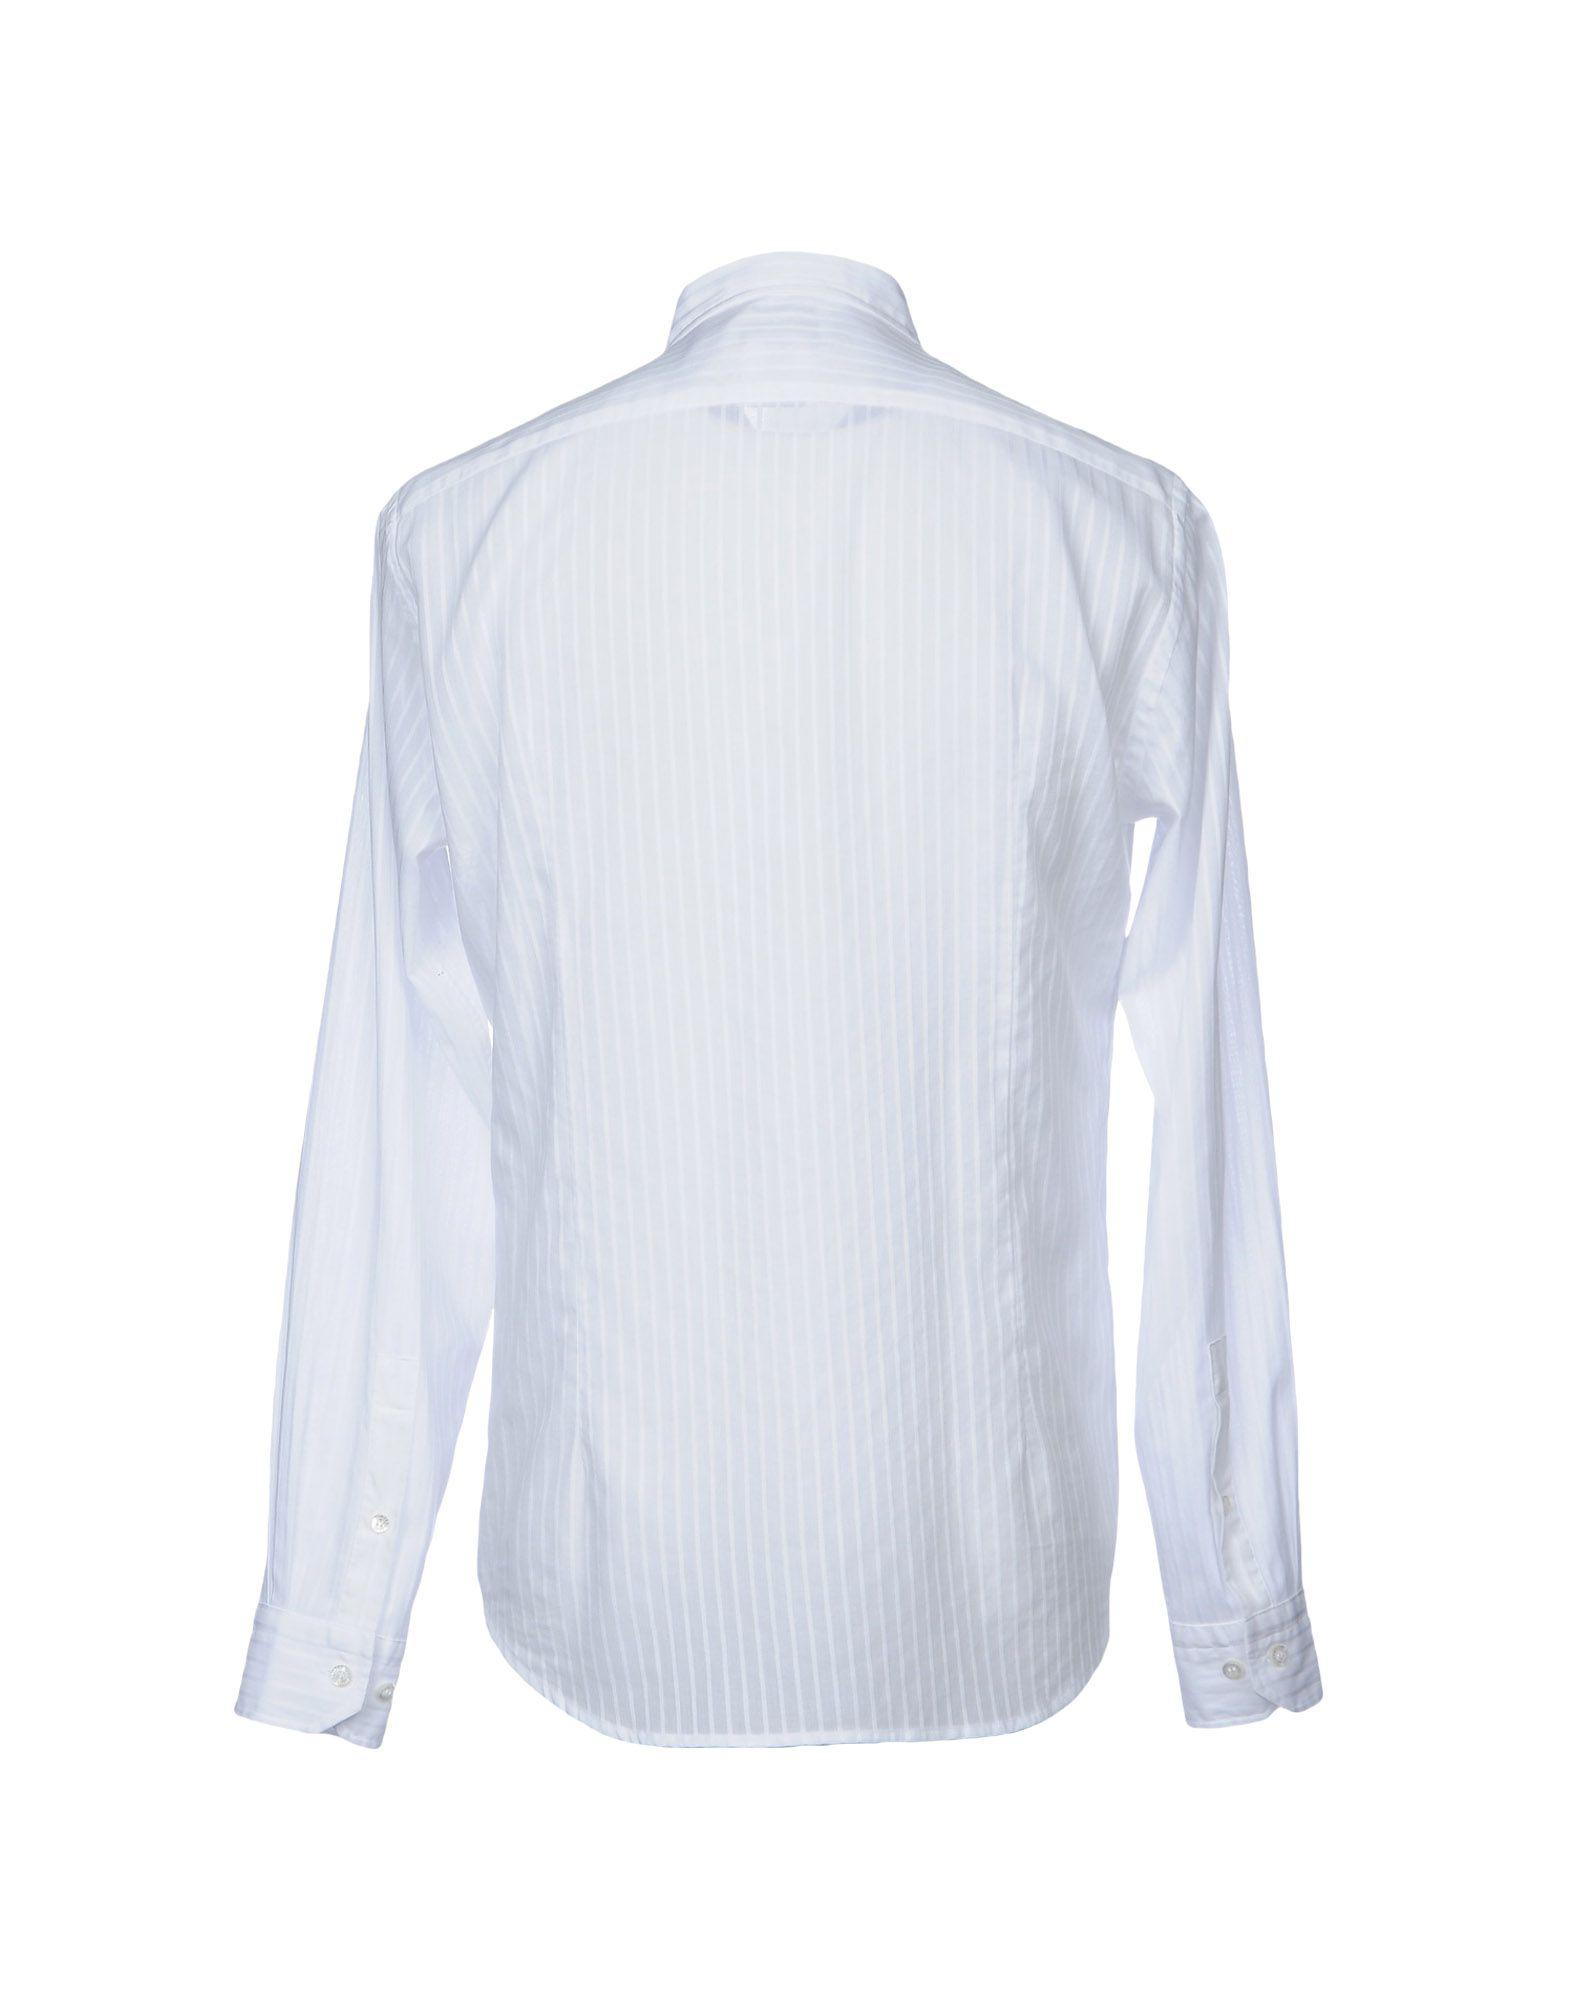 Camicia Tinta Unita Unita Unita Versace Collection Uomo - 38708831JE 7e817d